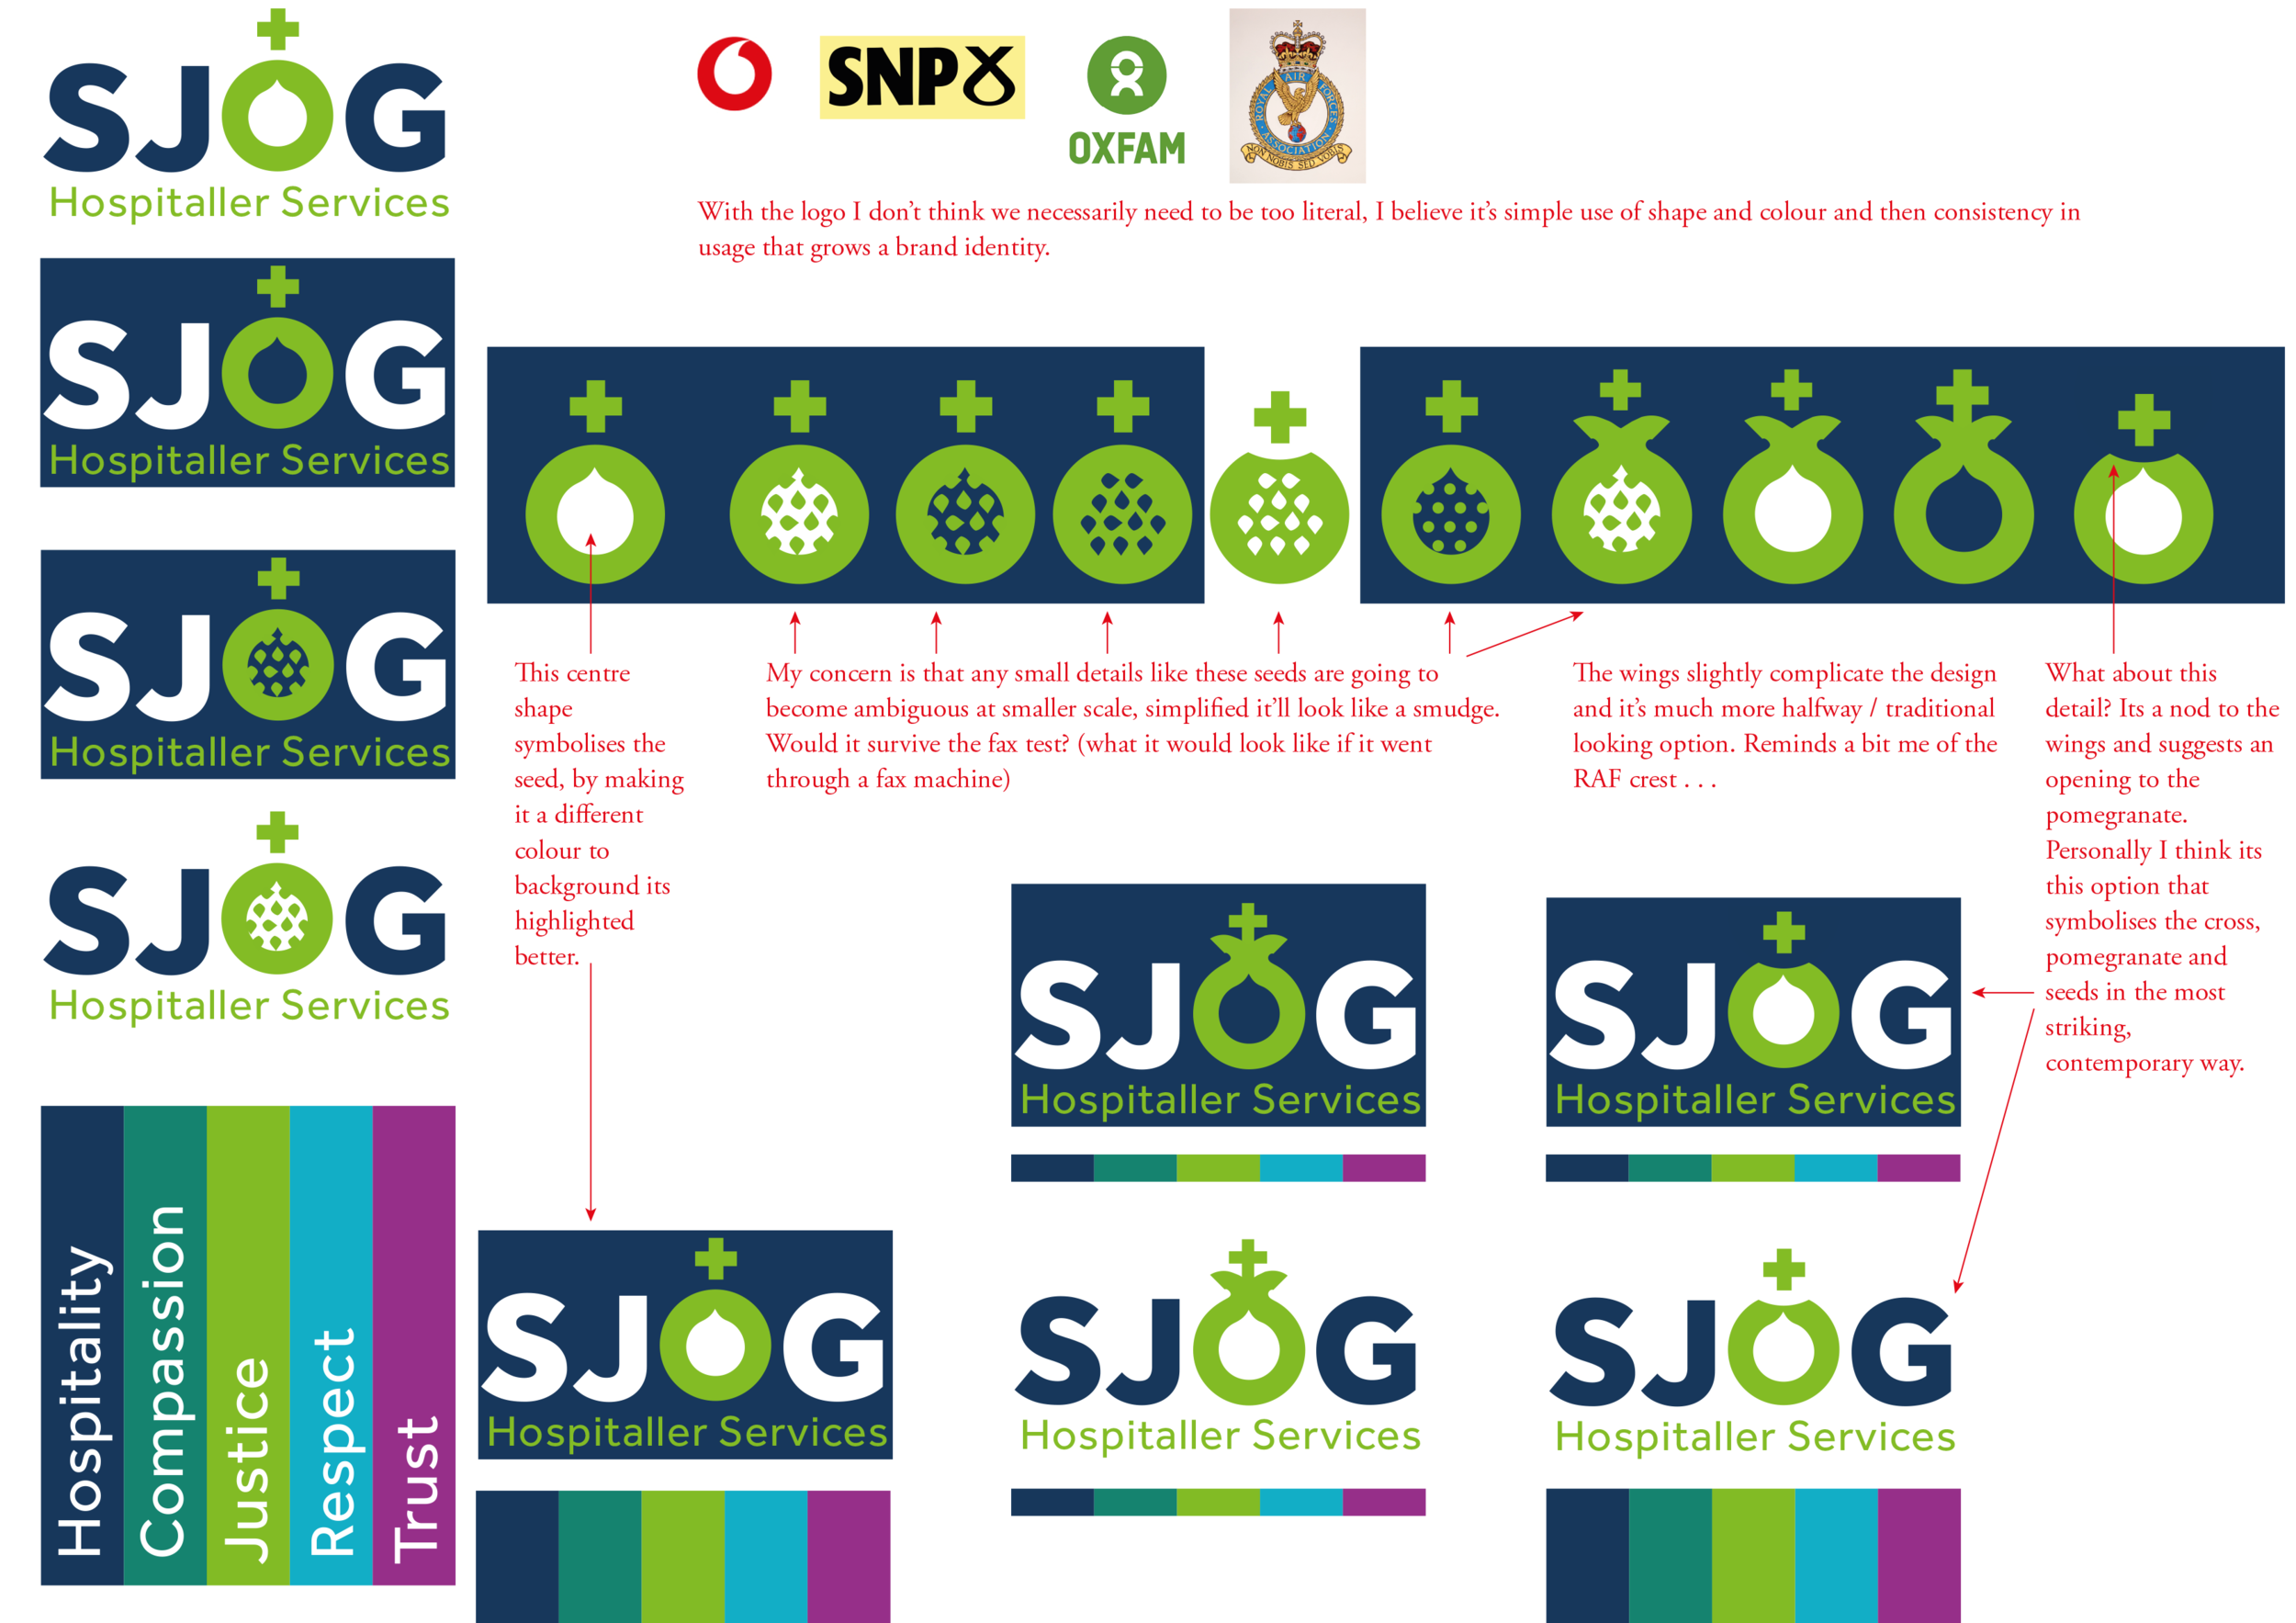 SJOG_3_initial_ideas_recommendations2.png